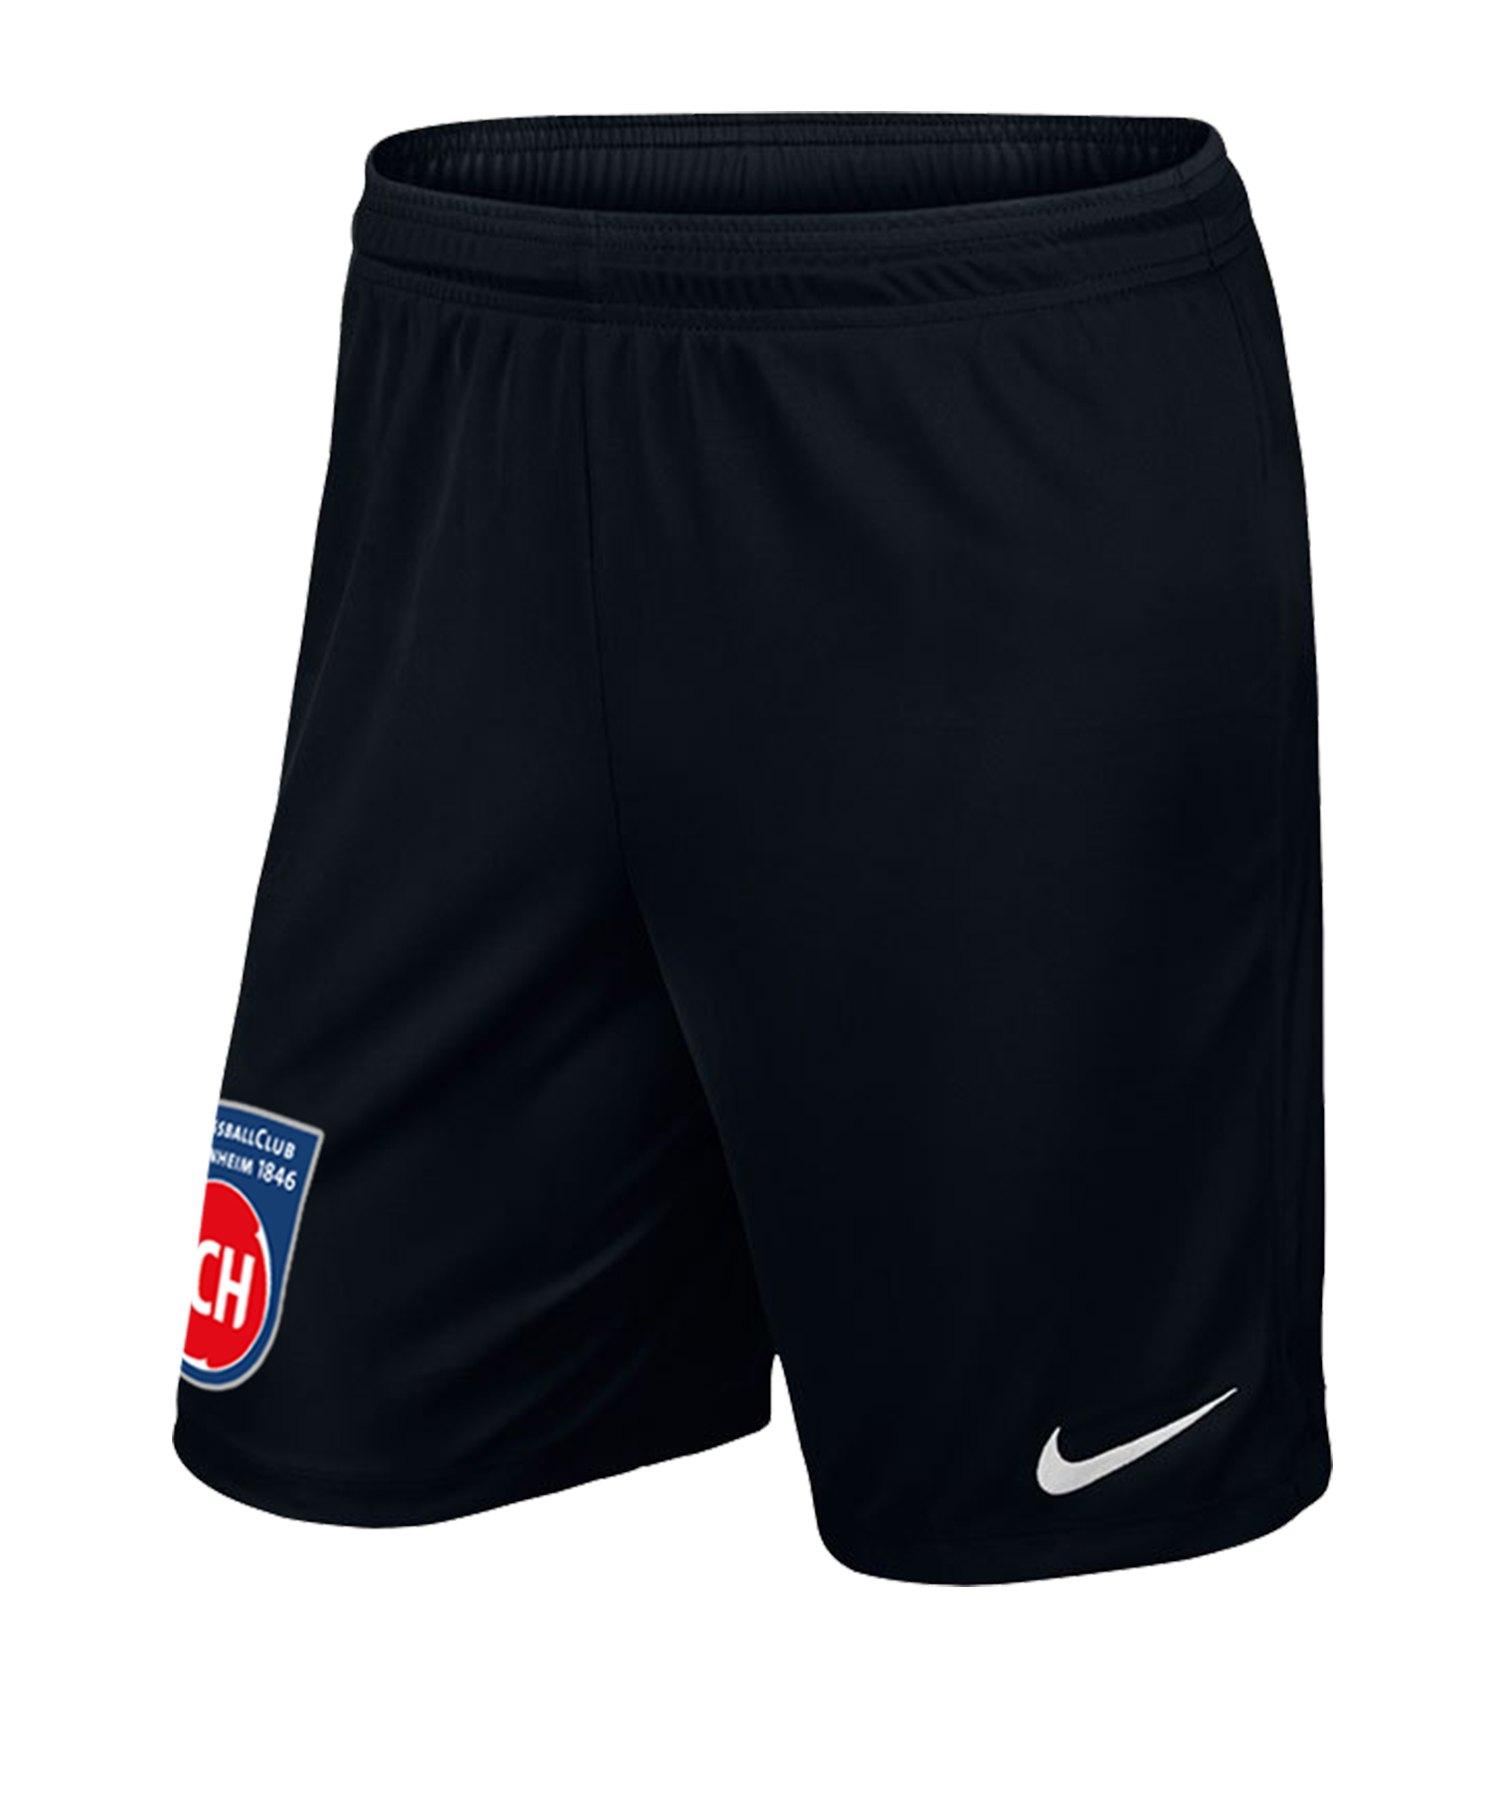 Nike 1. FC Heidenheim TW-Short 2019/2020 F010 - schwarz